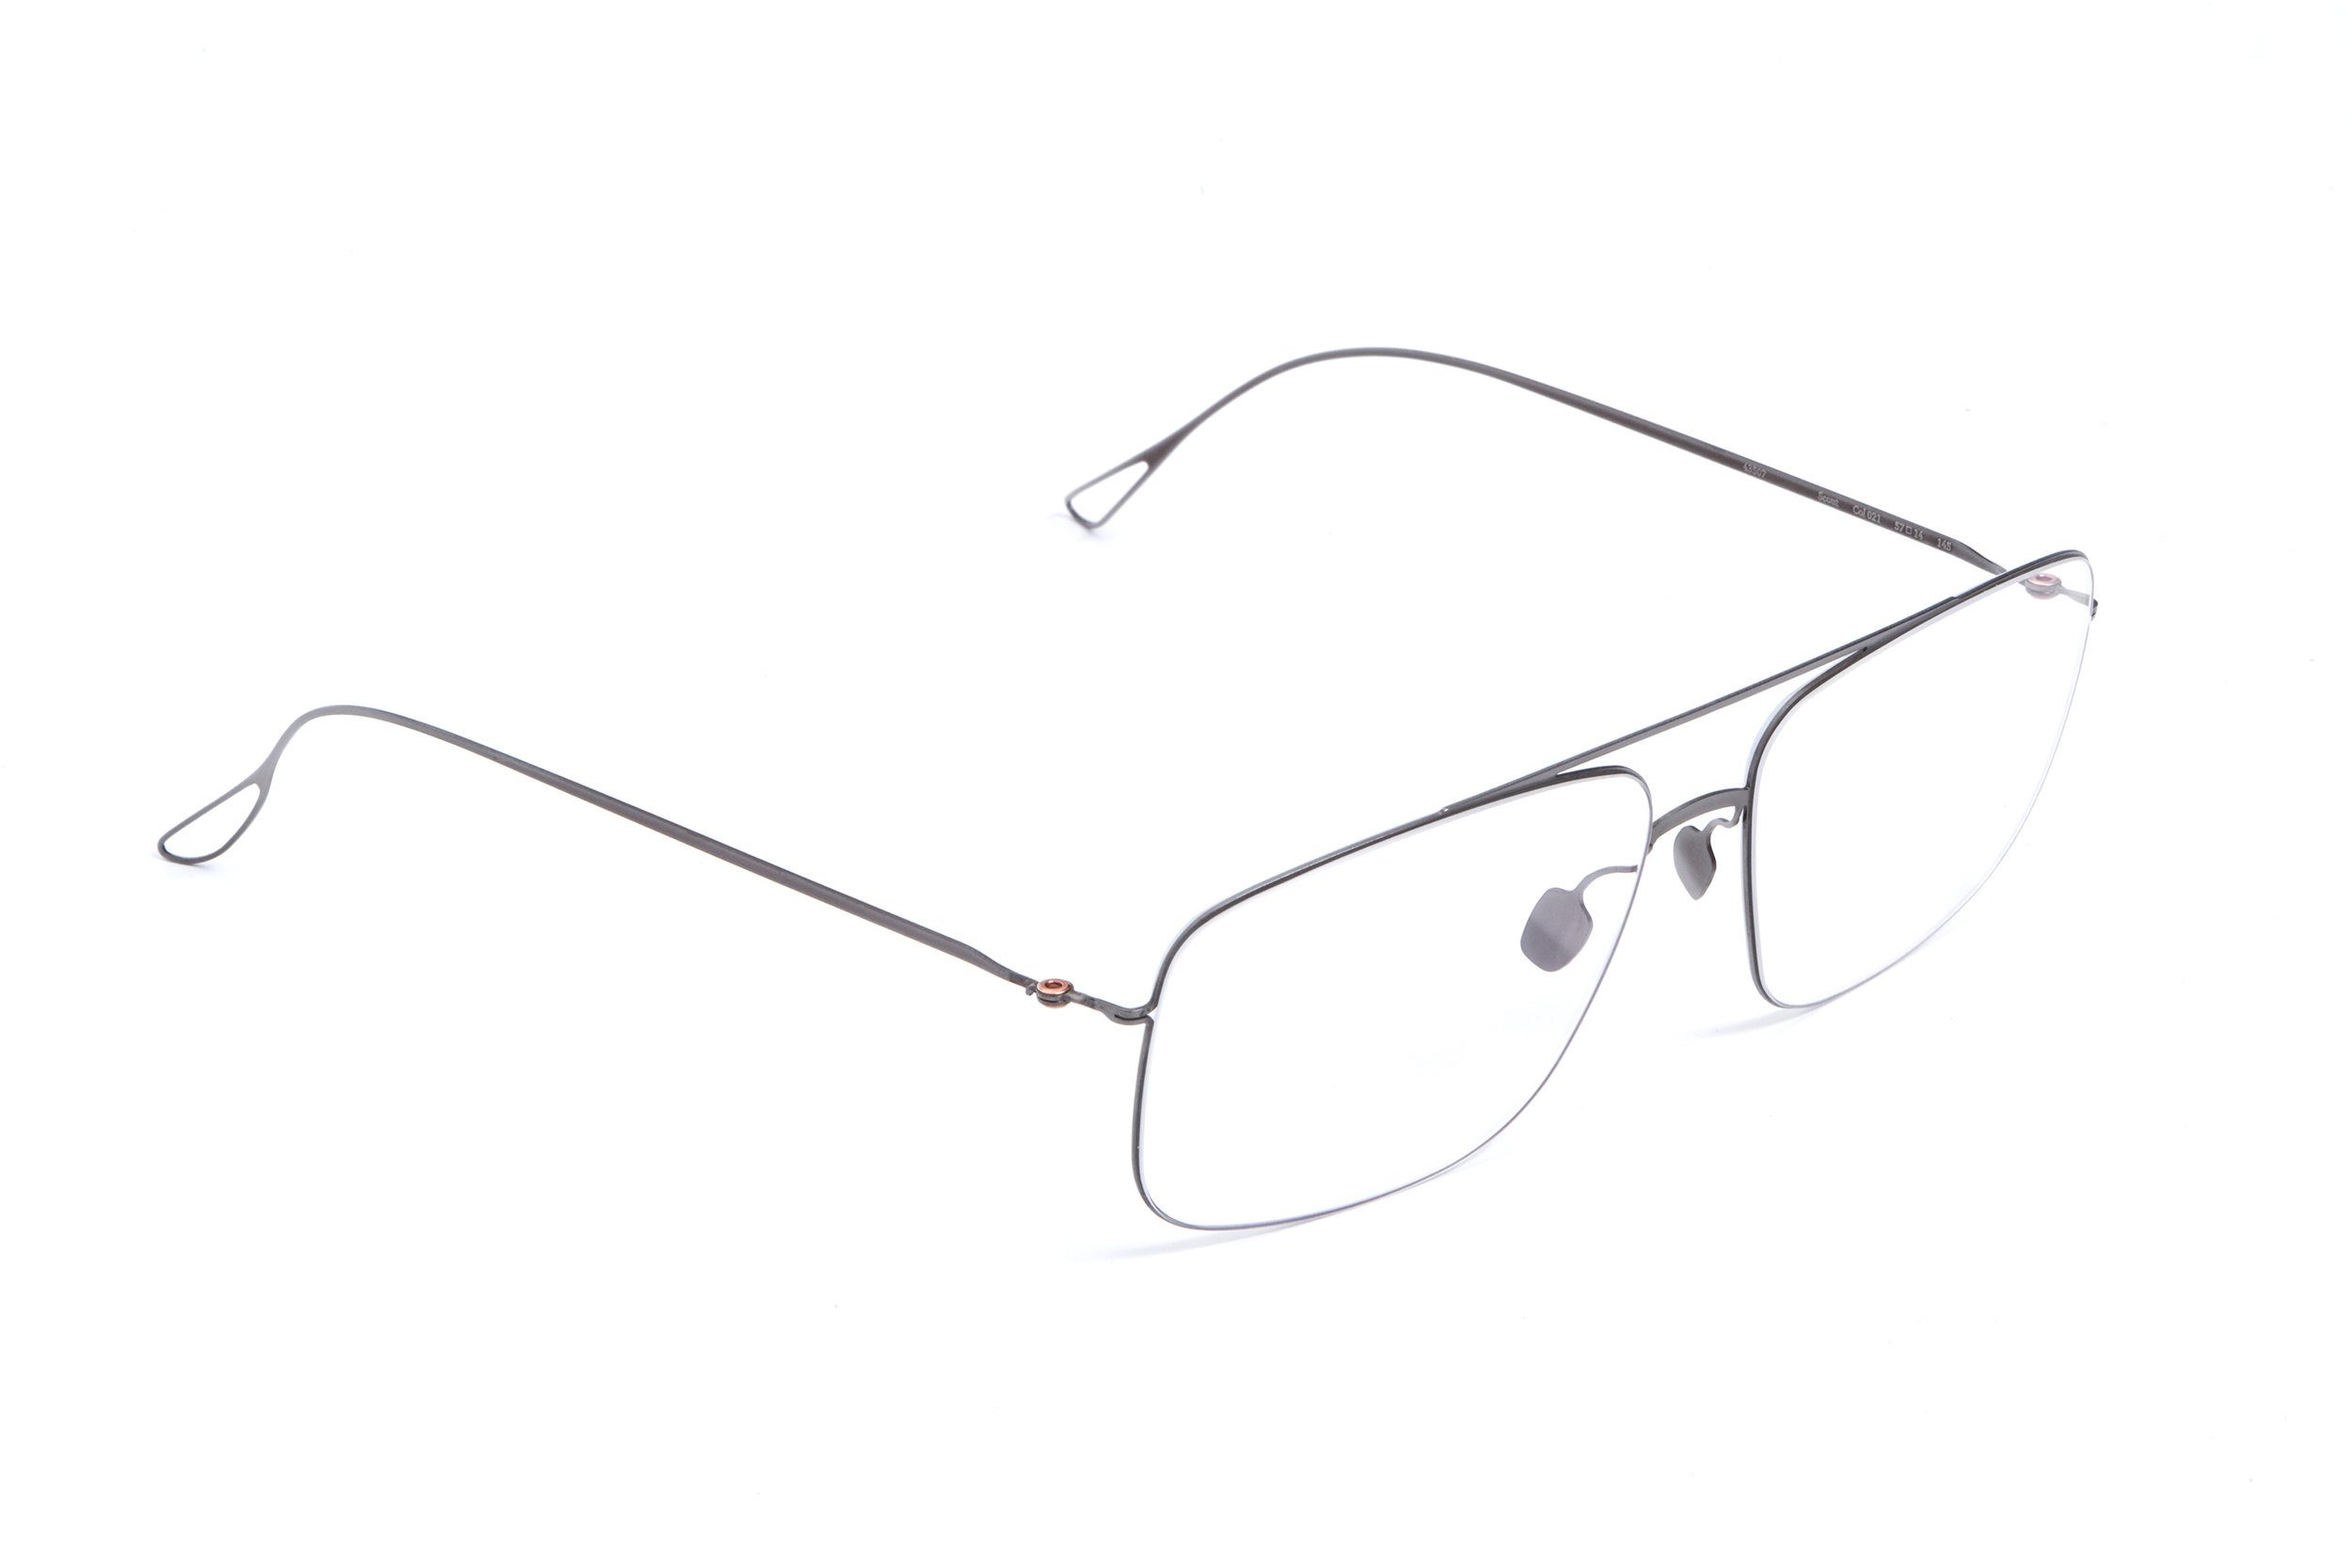 haffmans_neumeister_scout_gunmetal_clear_ultralight_eyeglasses_angle_102444.jpg